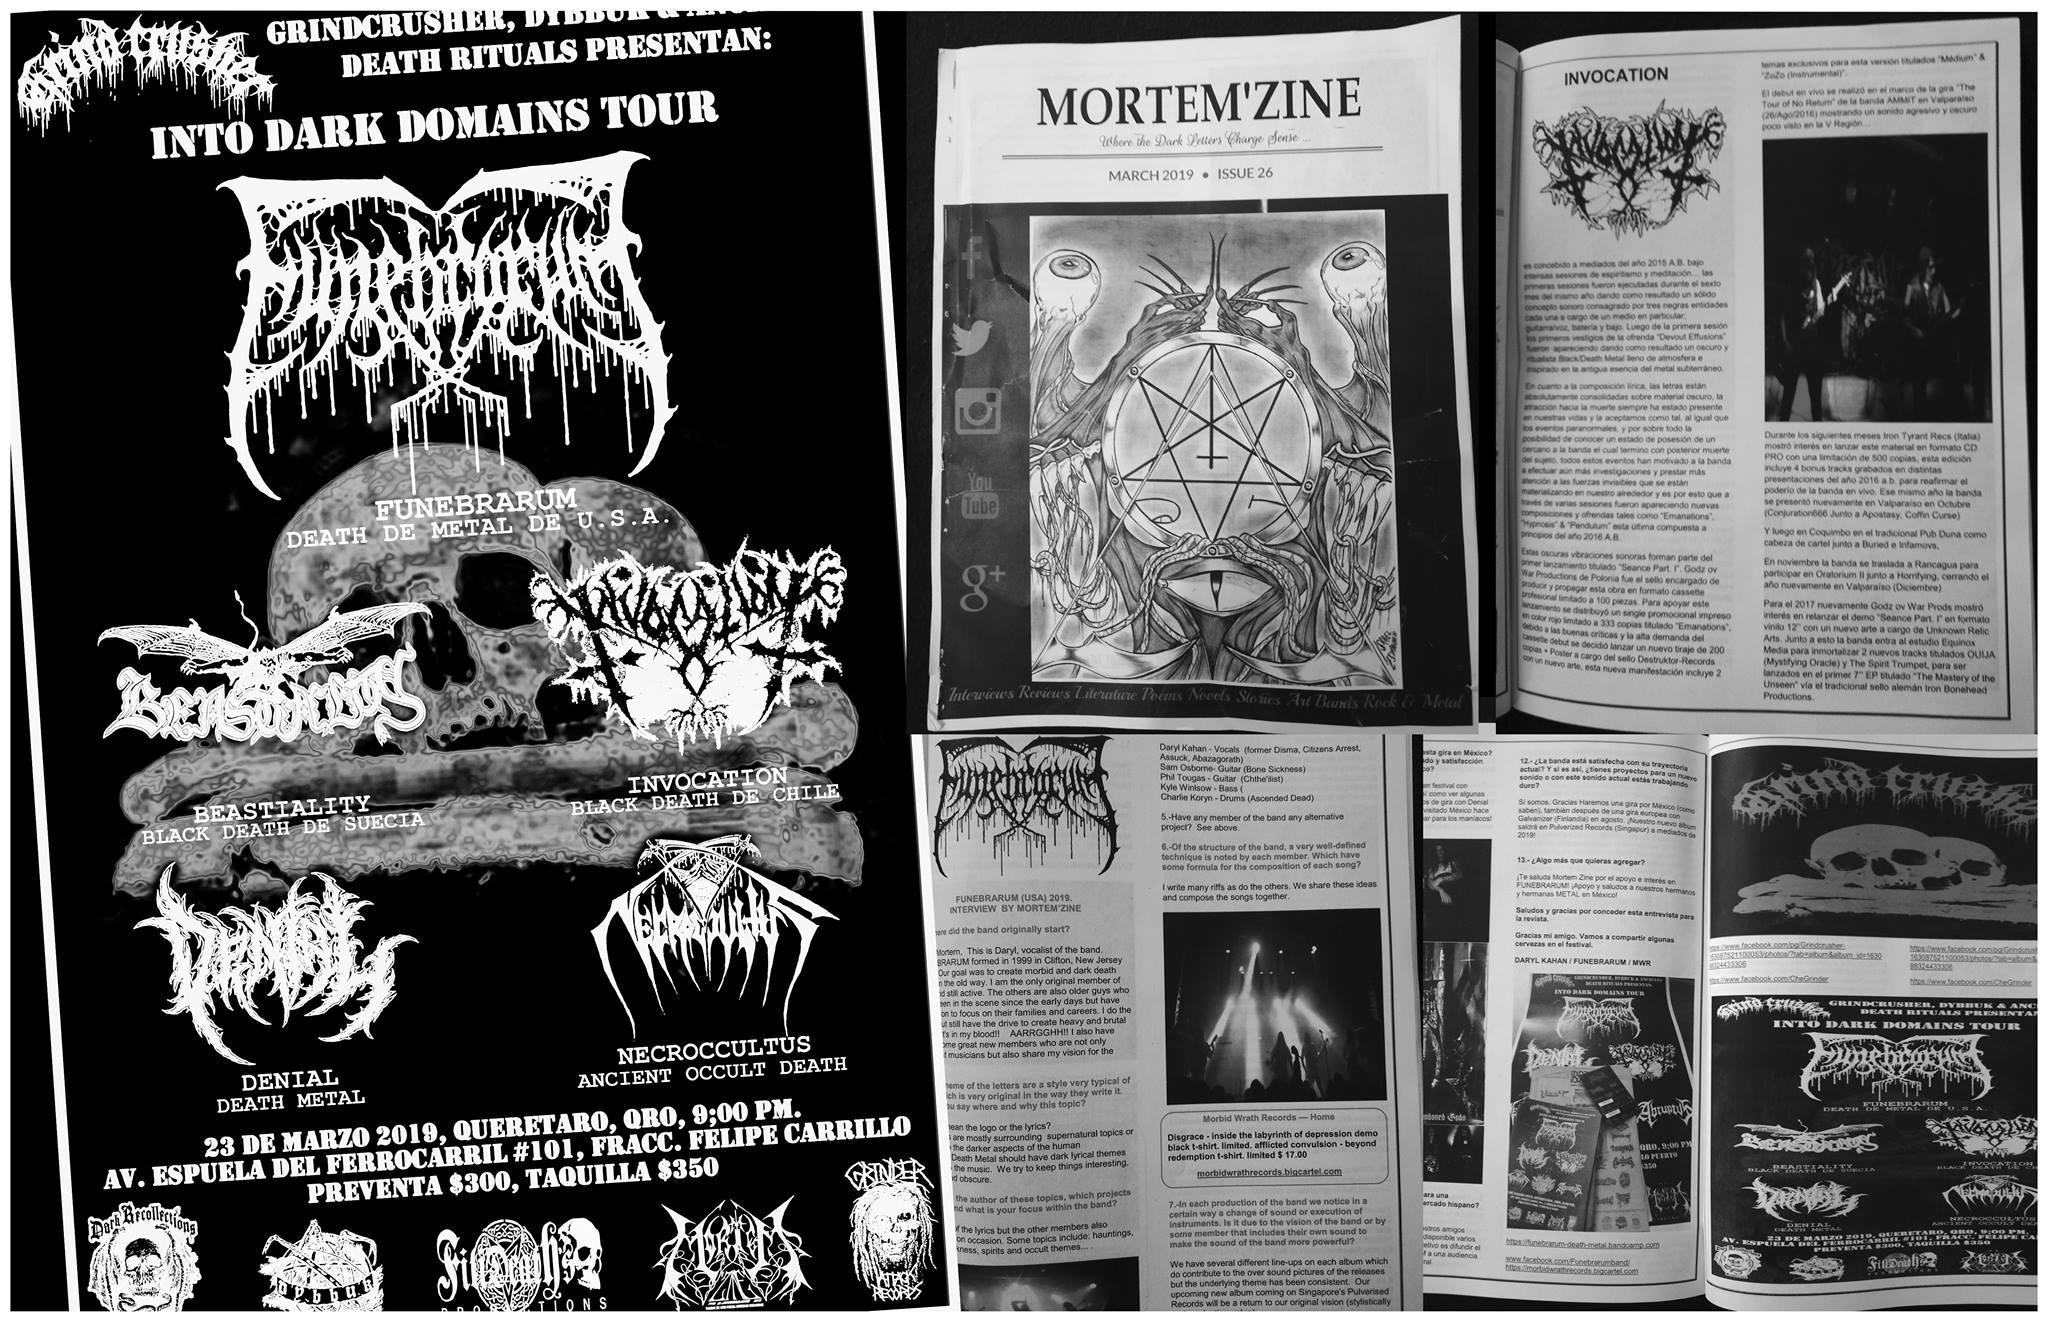 Funebrarum Mexico tour ad